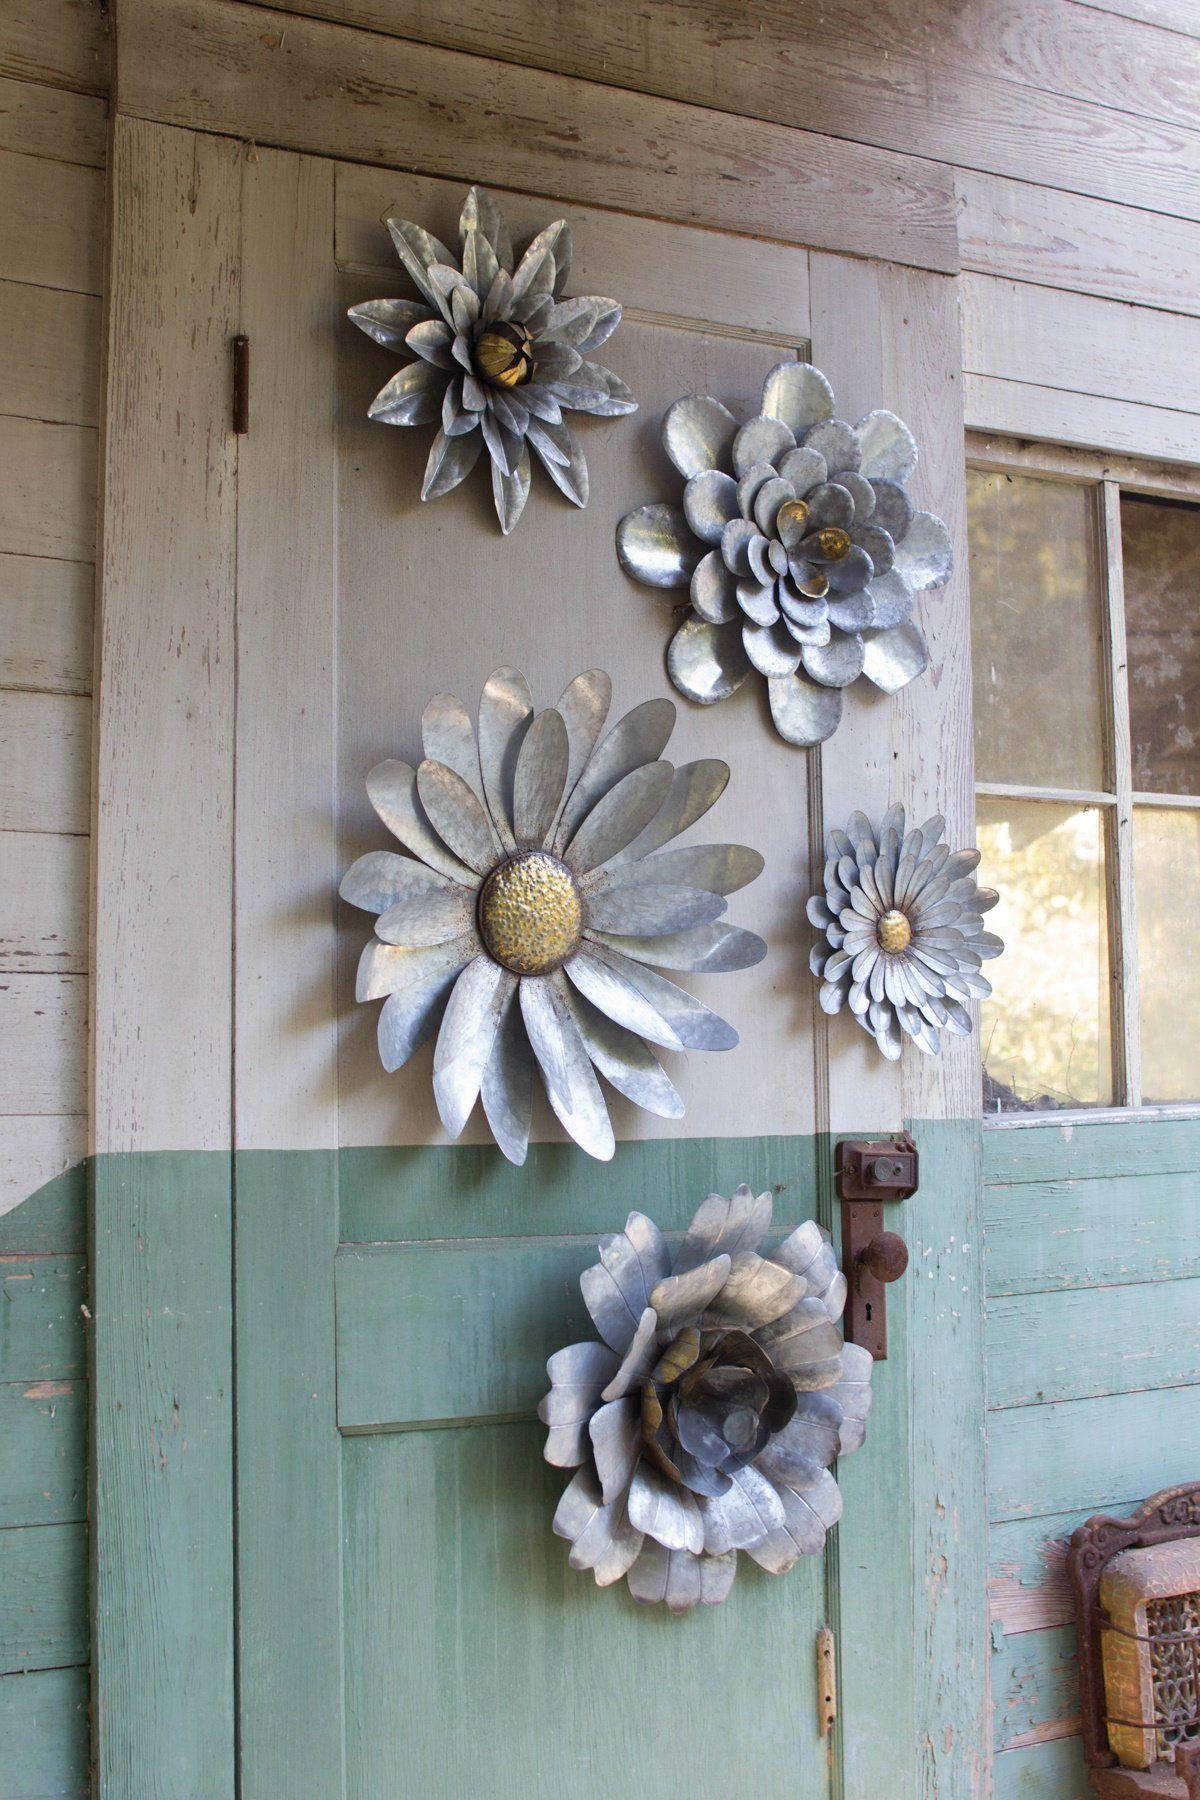 5 Pc Set Decorative And 3 Dimensional Flower Wall Decorations Galvanized Metal Metal Flowers Scrap Metal Art Metal Garden Art